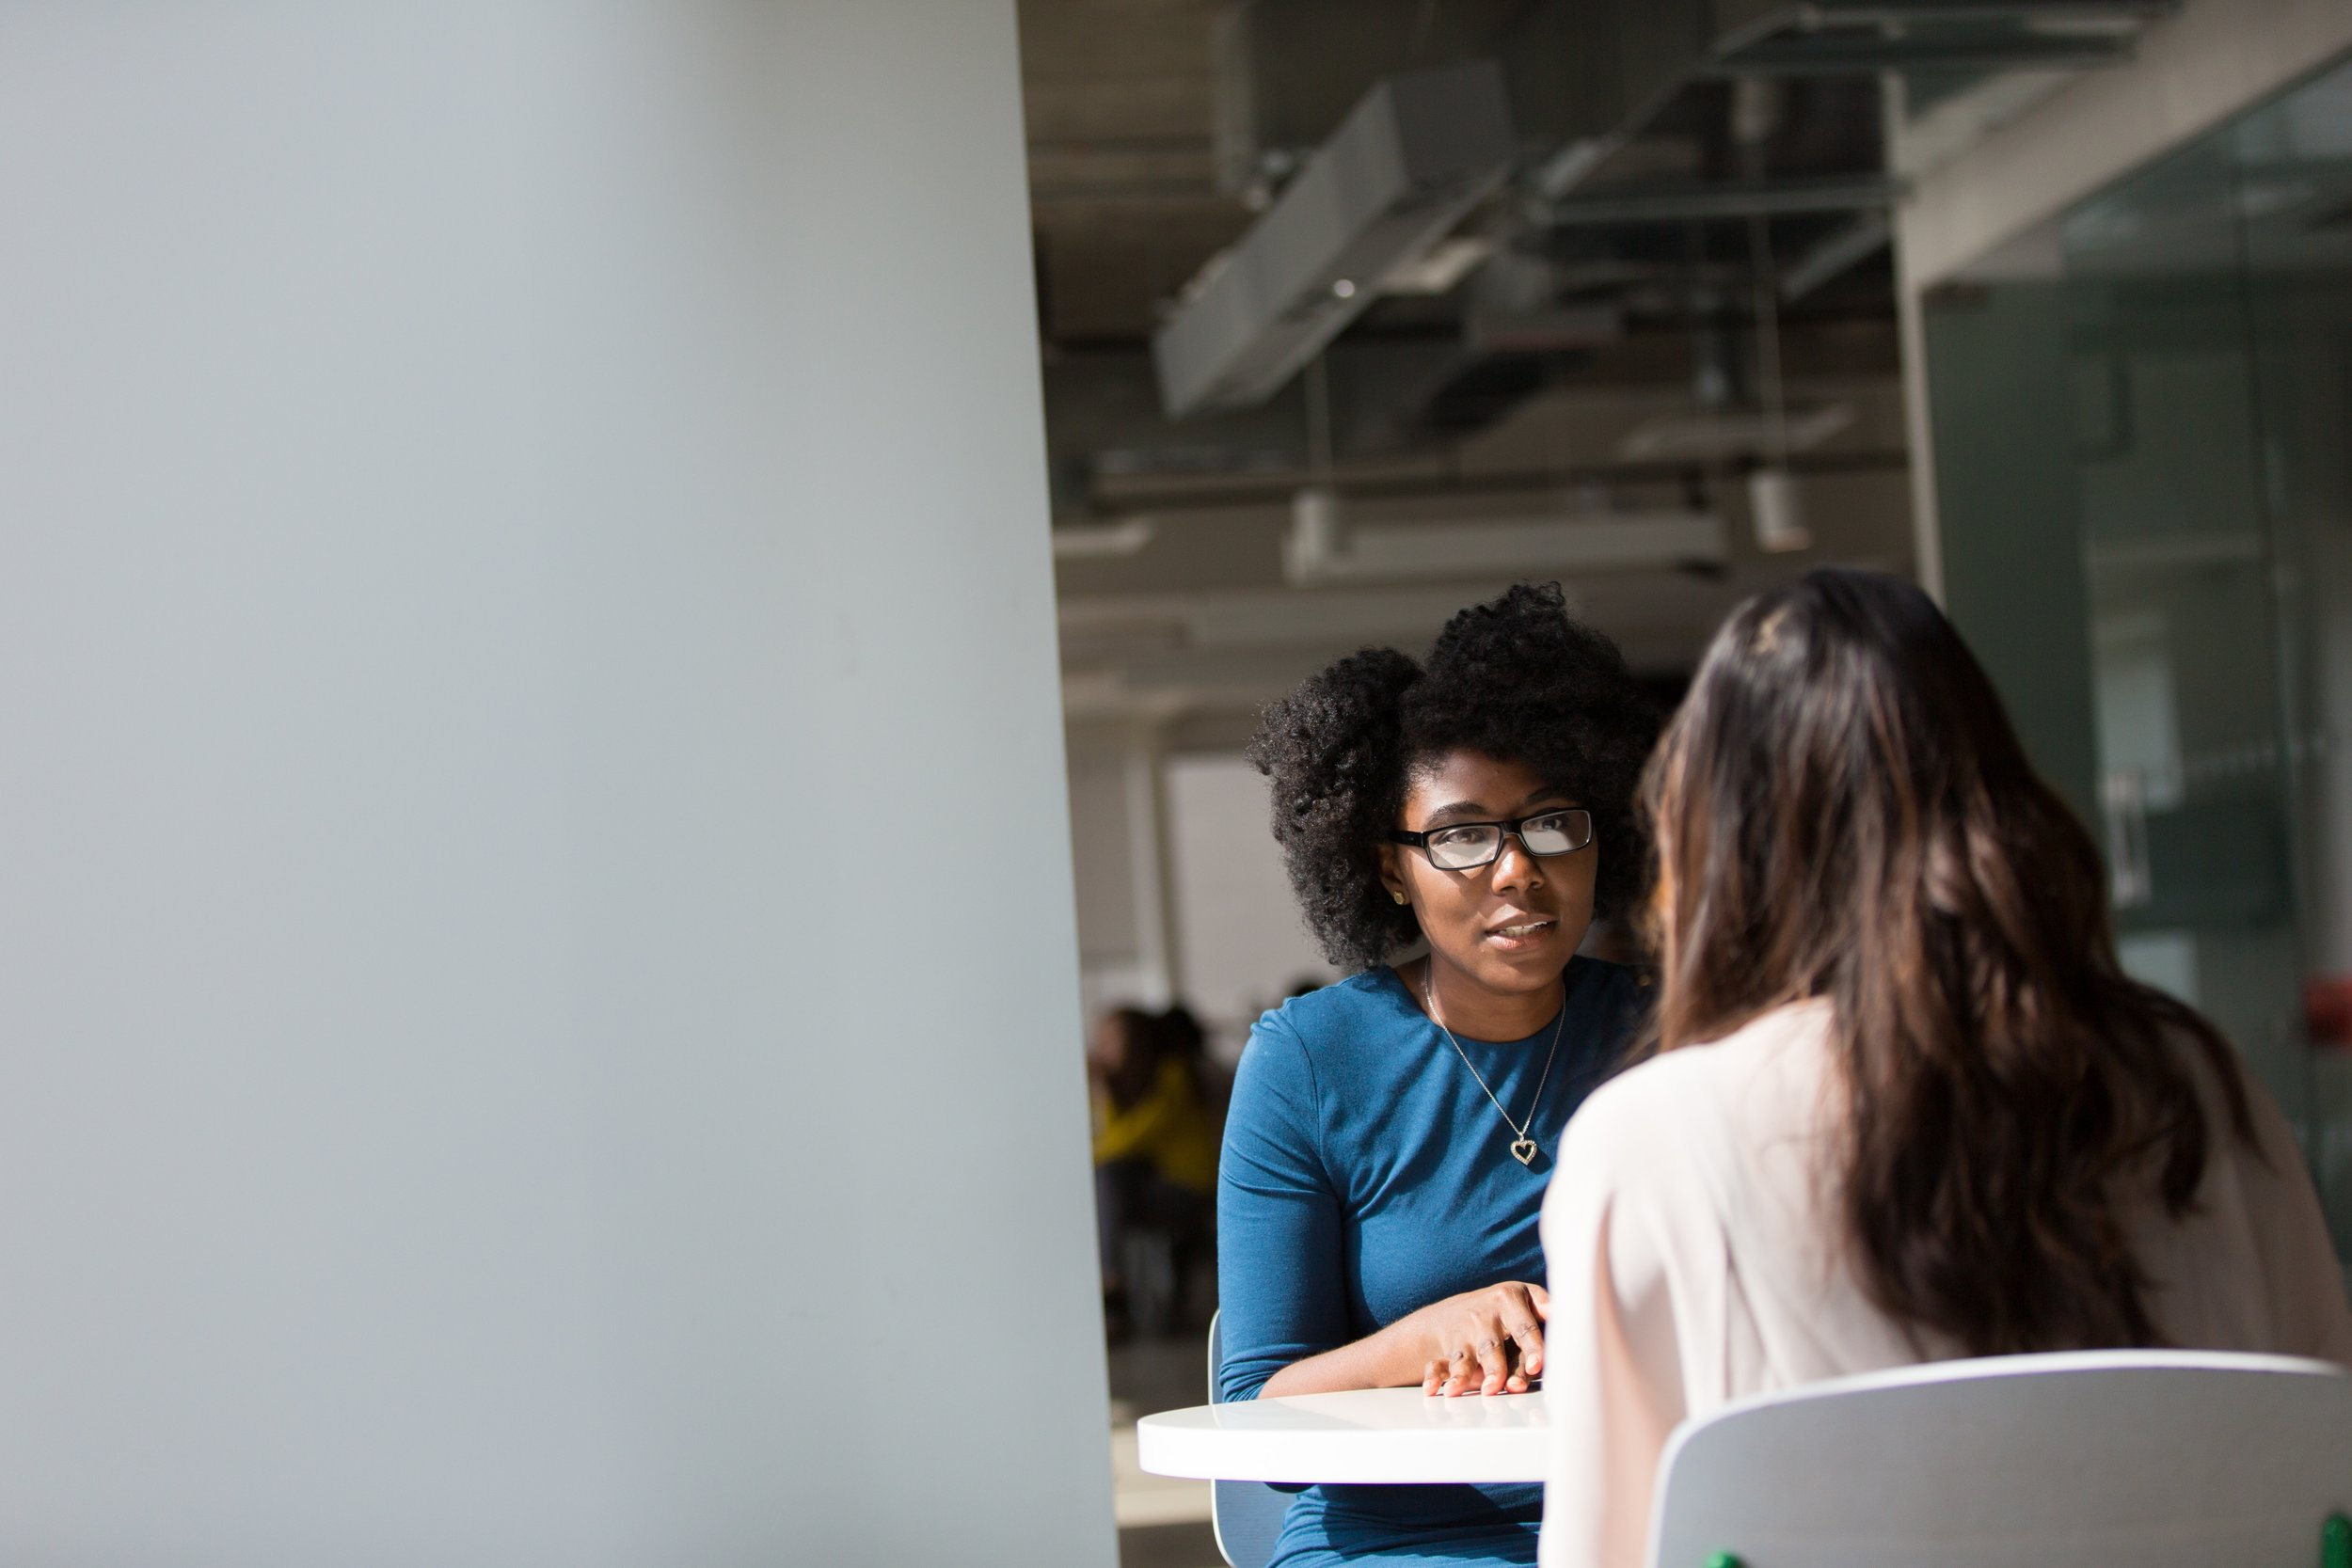 adult-conversation-discussing-1181712.jpg